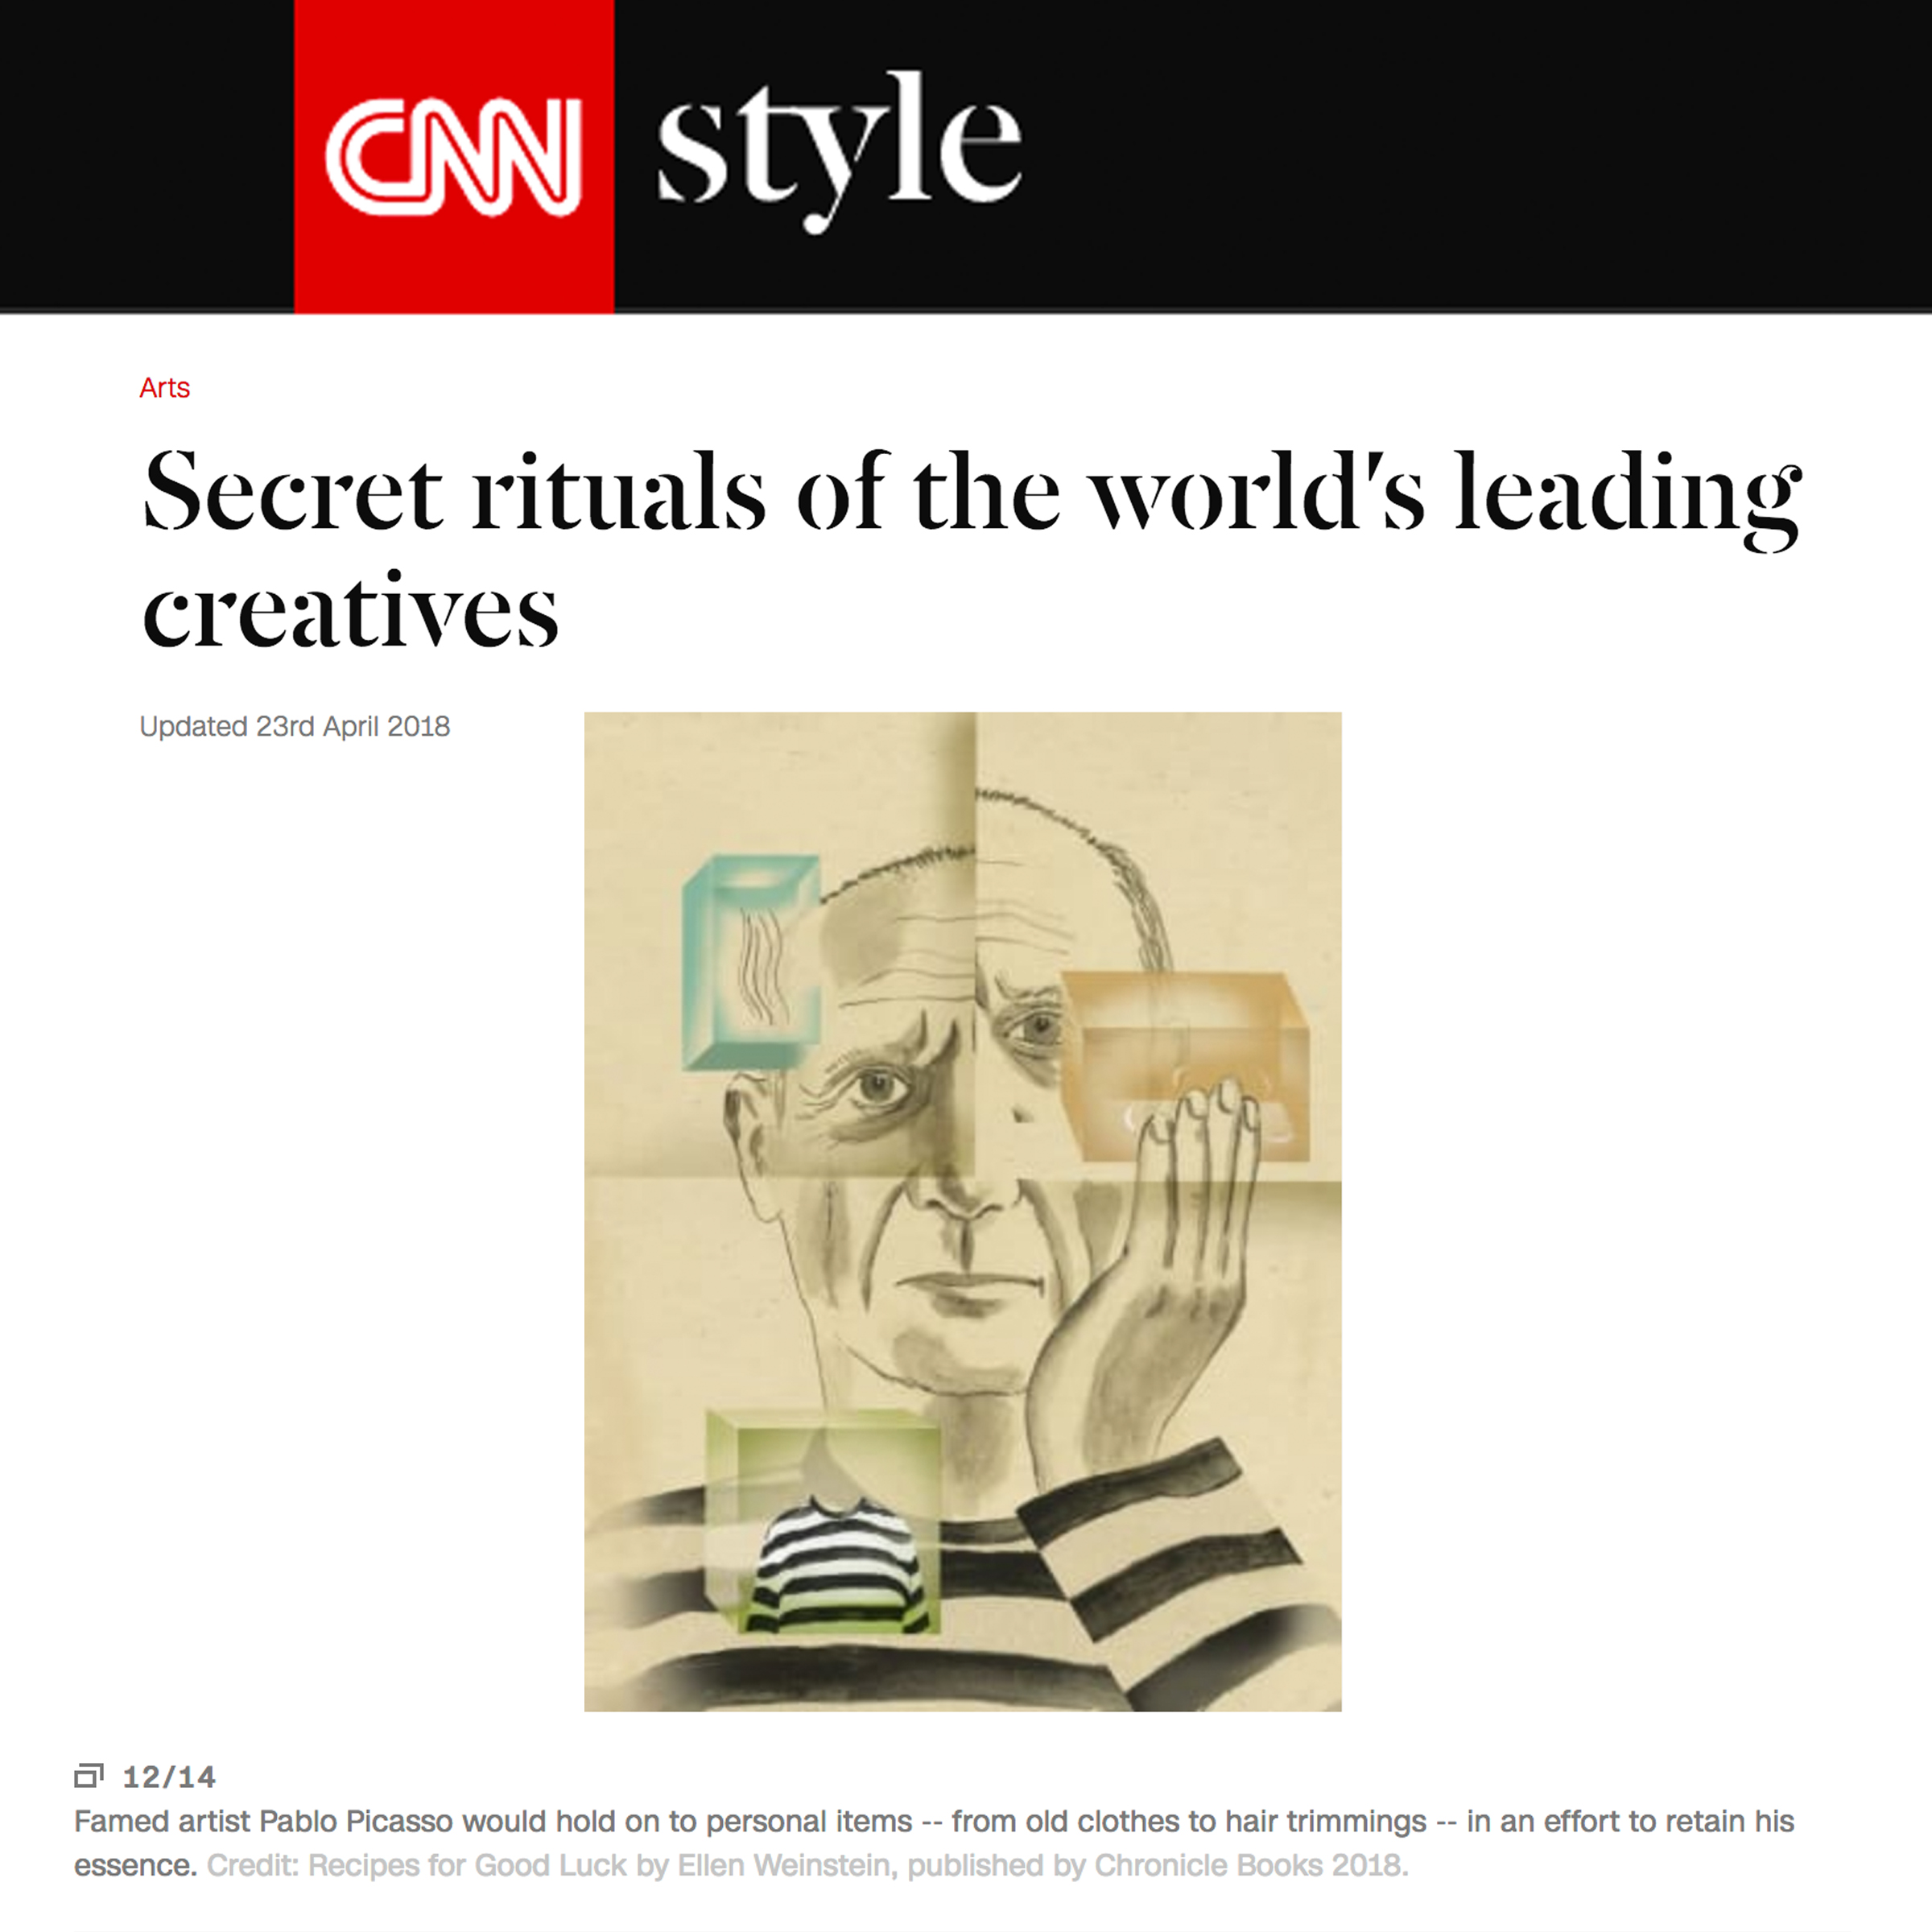 CNN.style.jpg